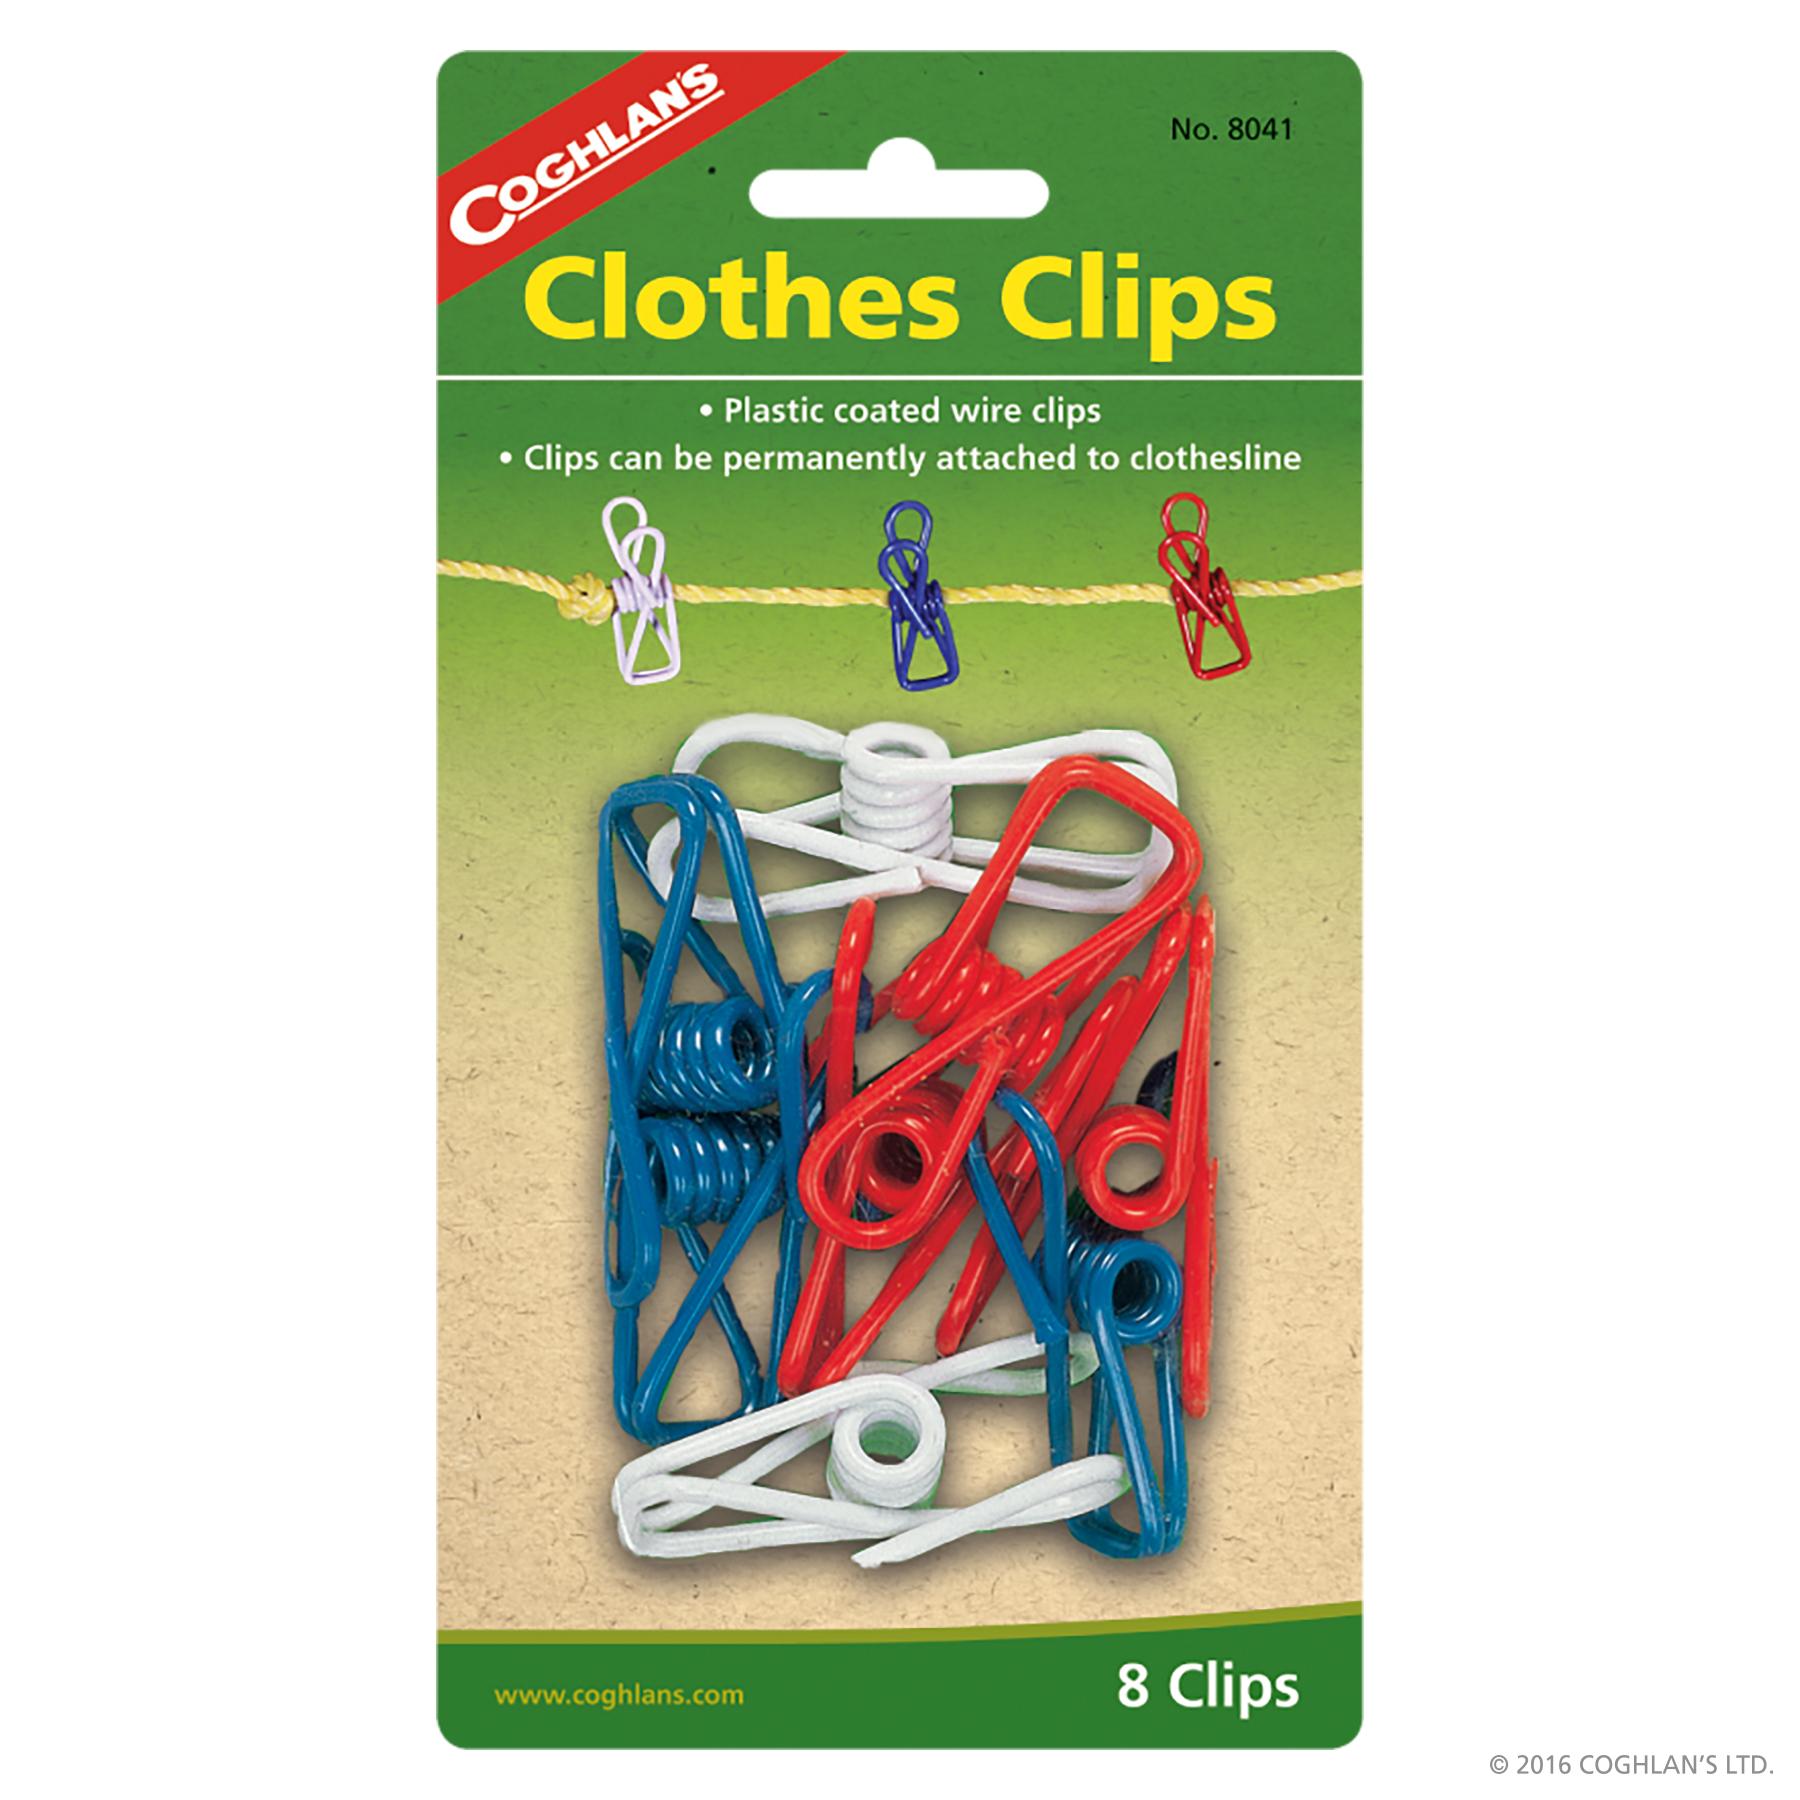 Coghlans Clothes Clips - Set of 8